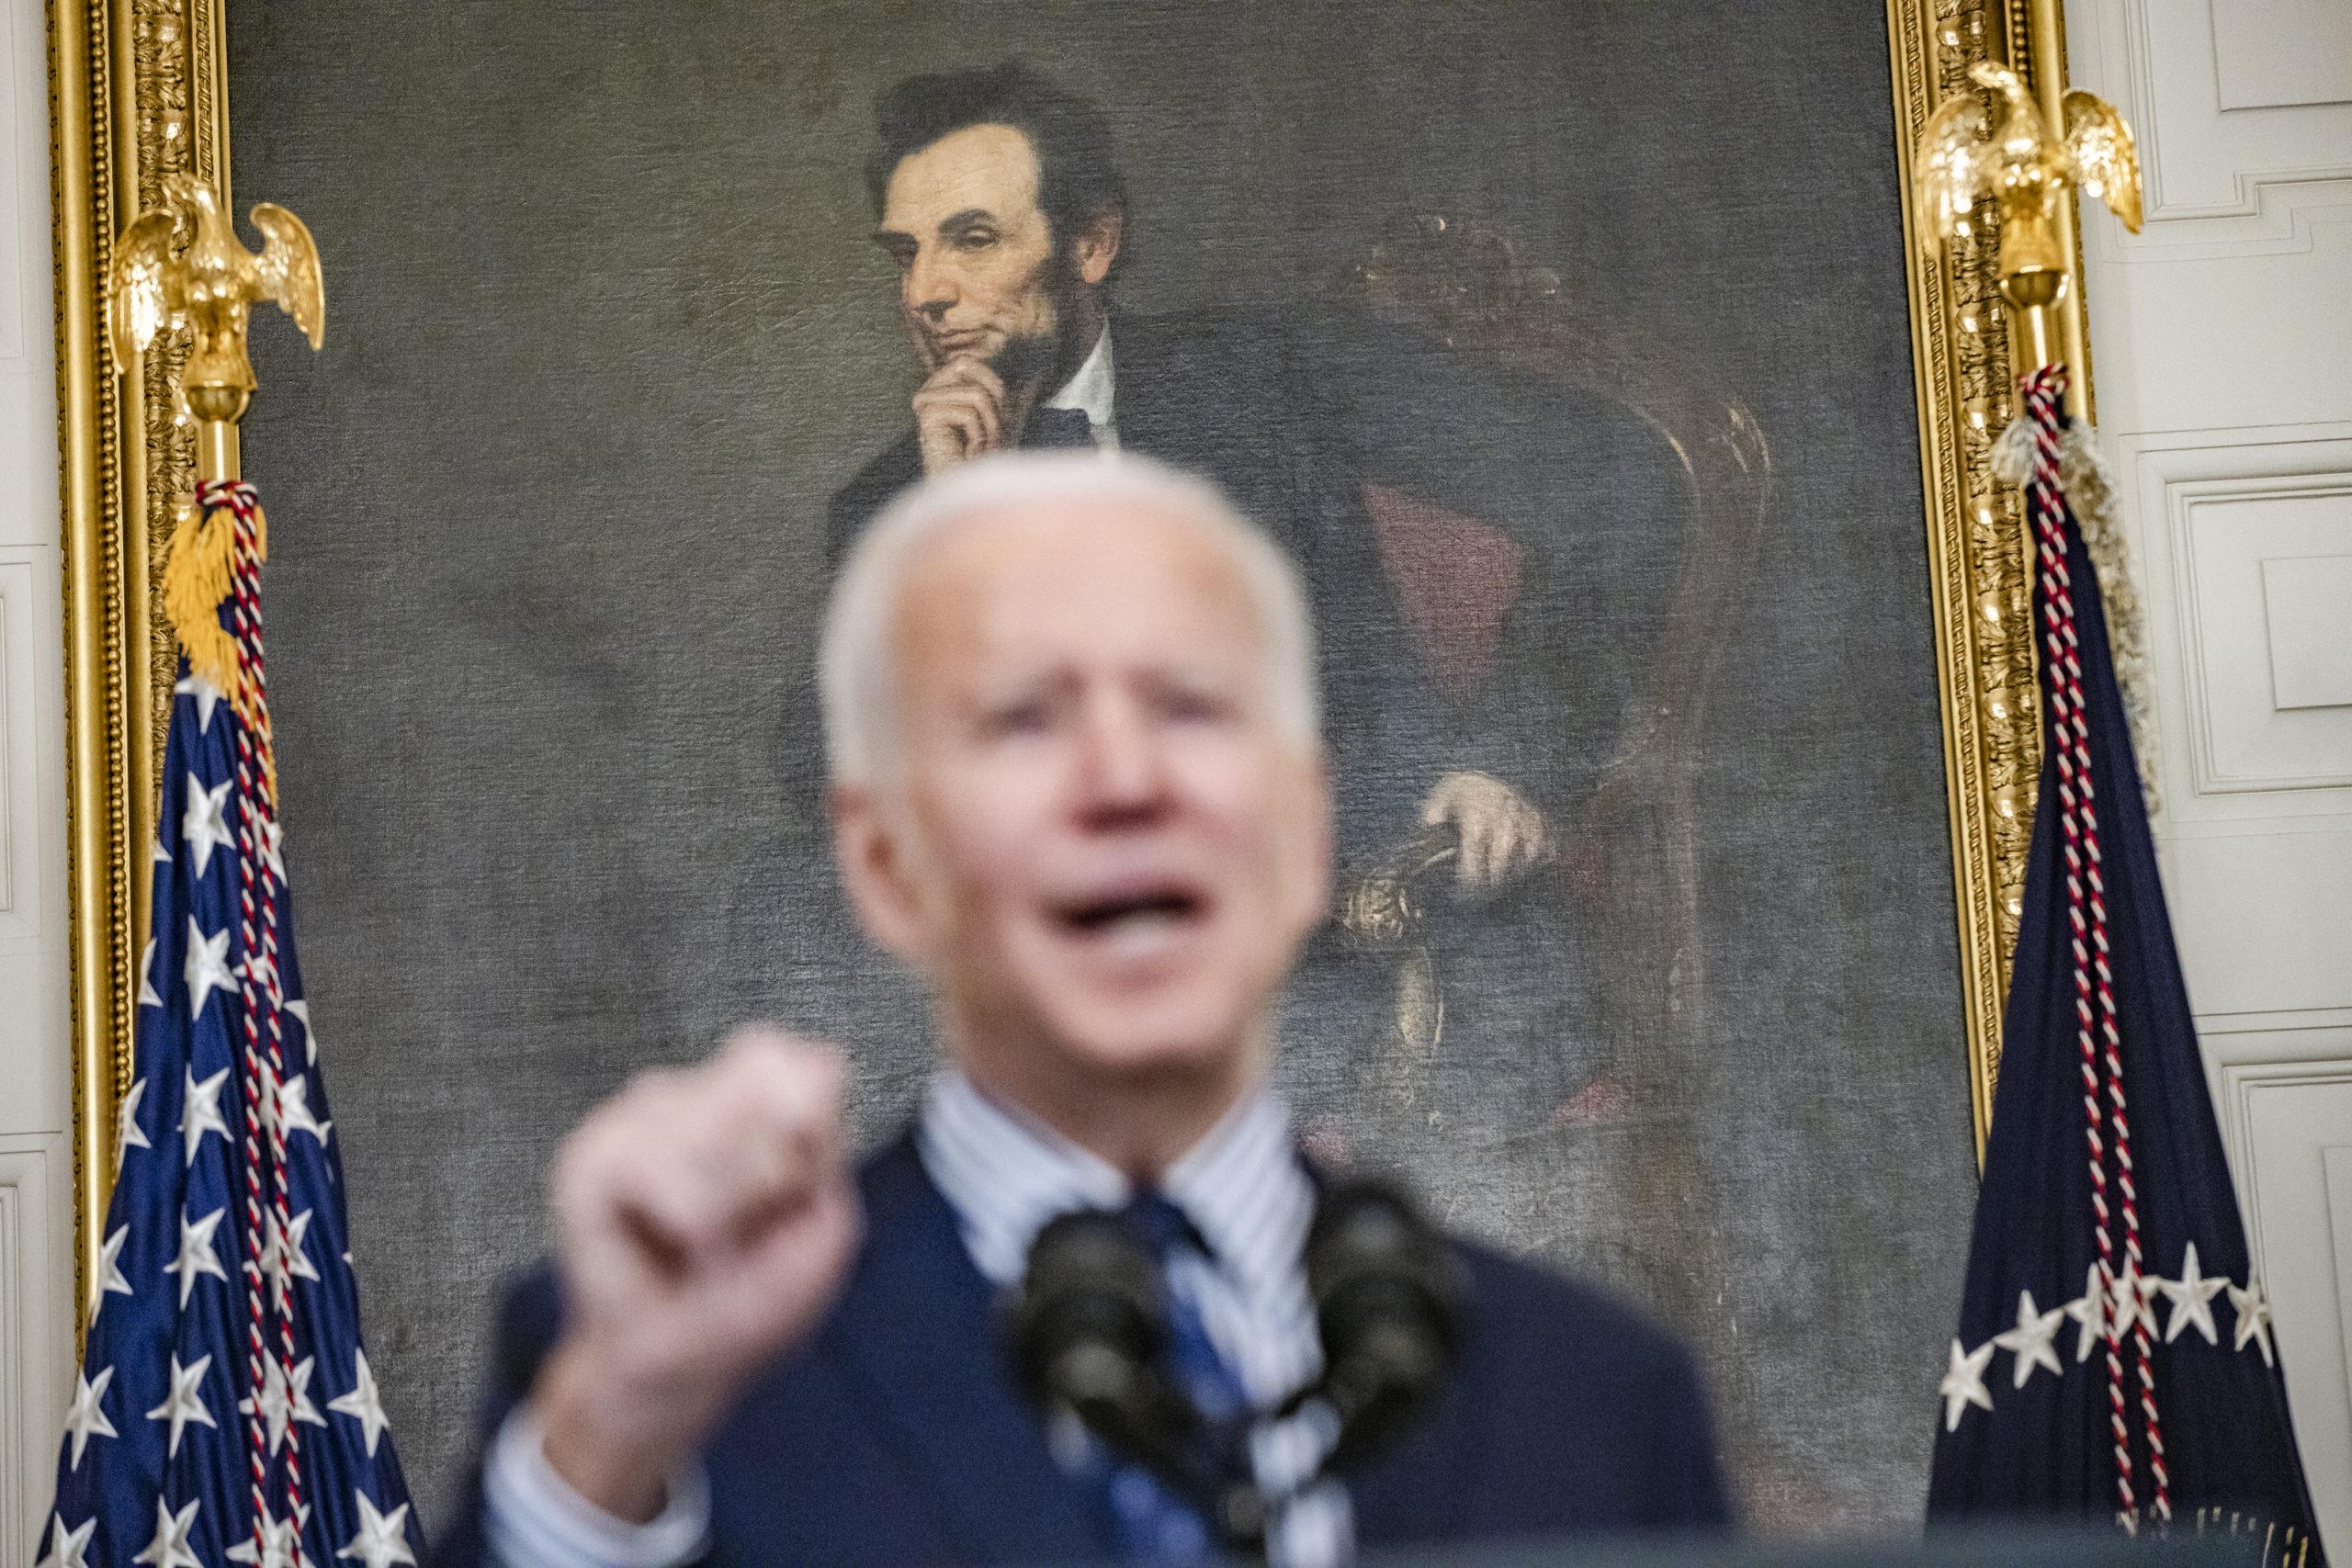 President Joe Biden speaks following the passage of the American Rescue Plan on Saturday. (Samuel Corum/Getty Images)